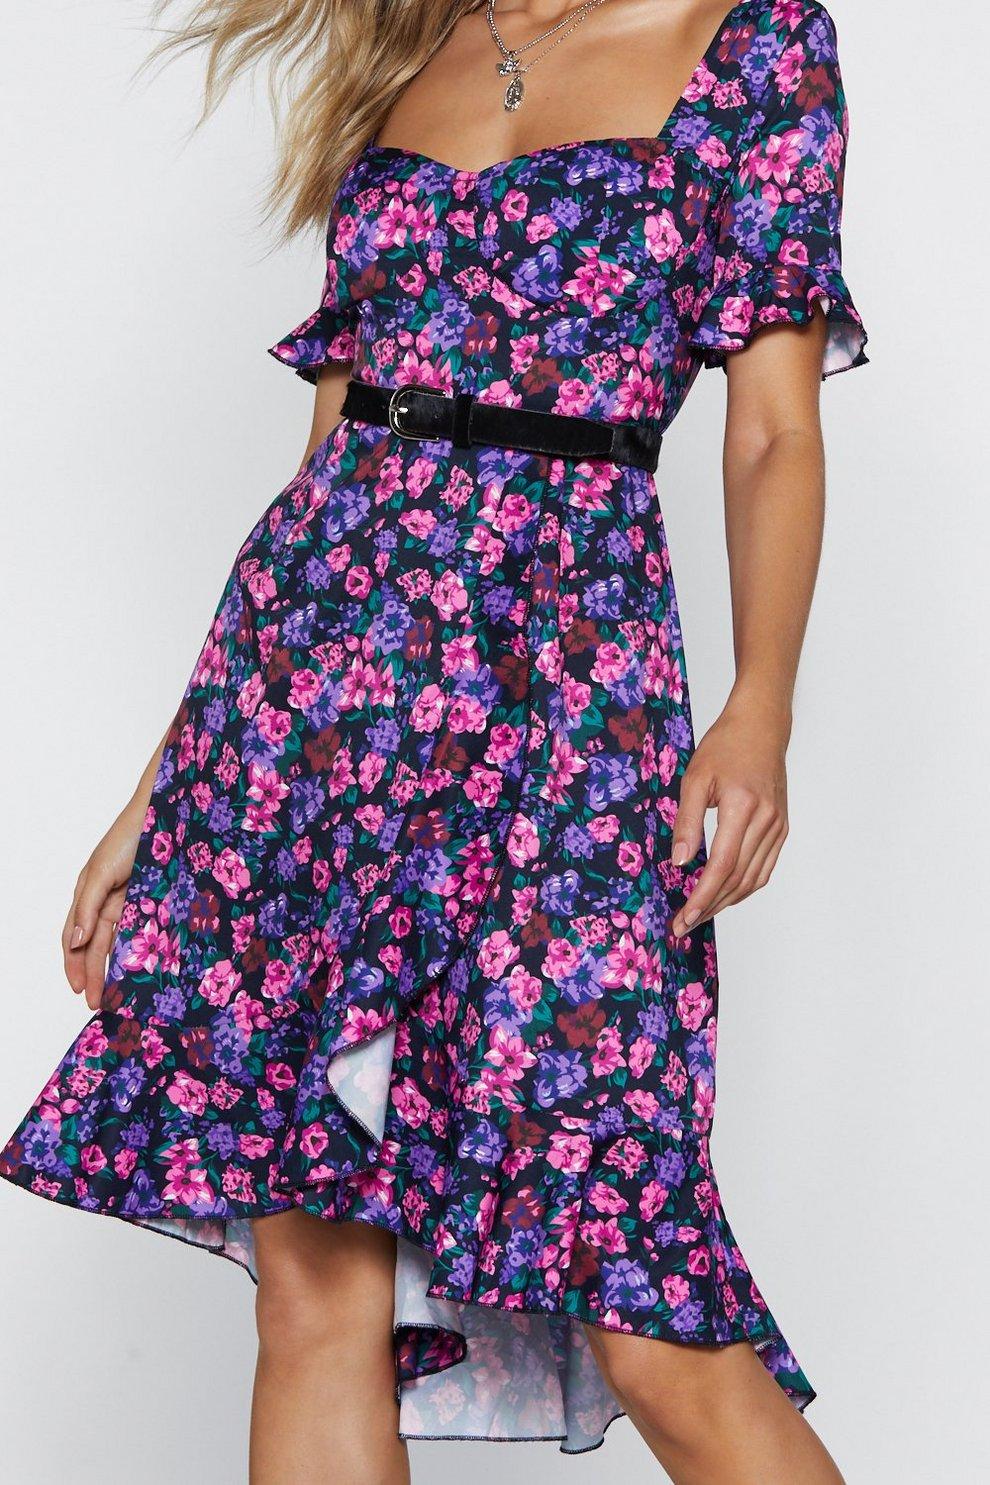 981da13cb0cf6 Field Trip Floral Dress | Shop Clothes at Nasty Gal!